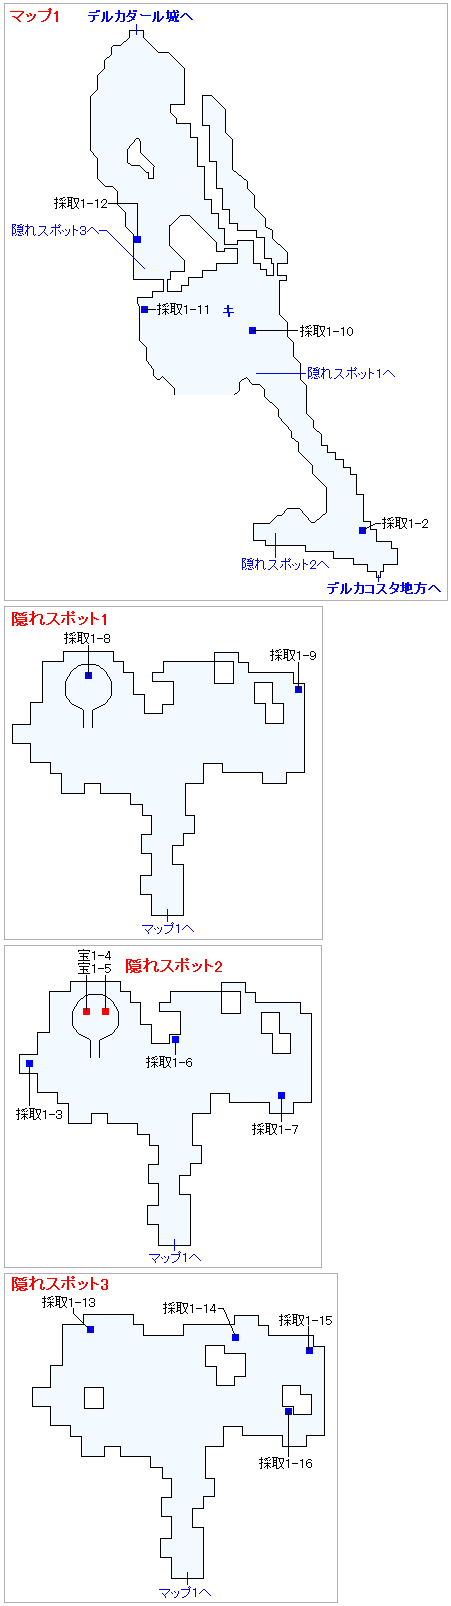 Switch版(2D)&3DS版(2D)ストーリー攻略マップ・デルカダール地方